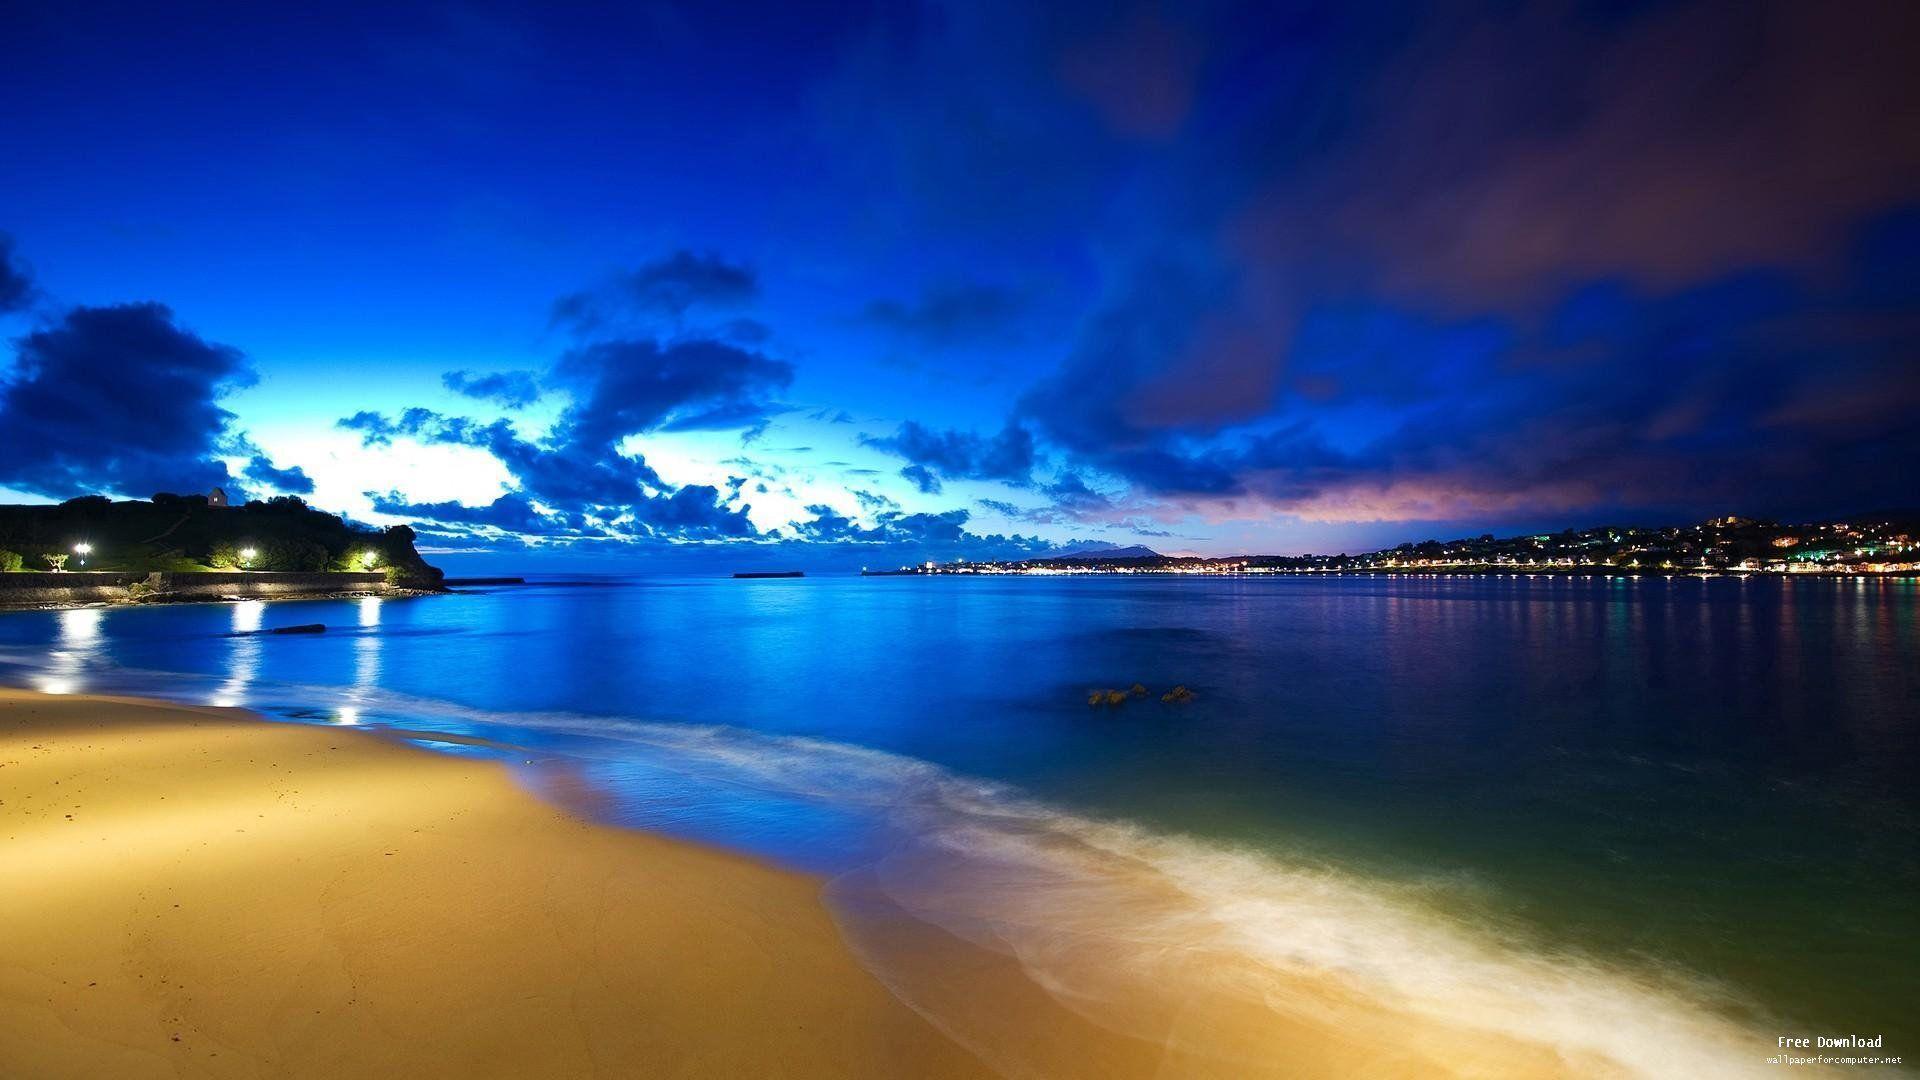 Beautiful Beach Images Hd Nature: Beautiful Beaches Wallpapers